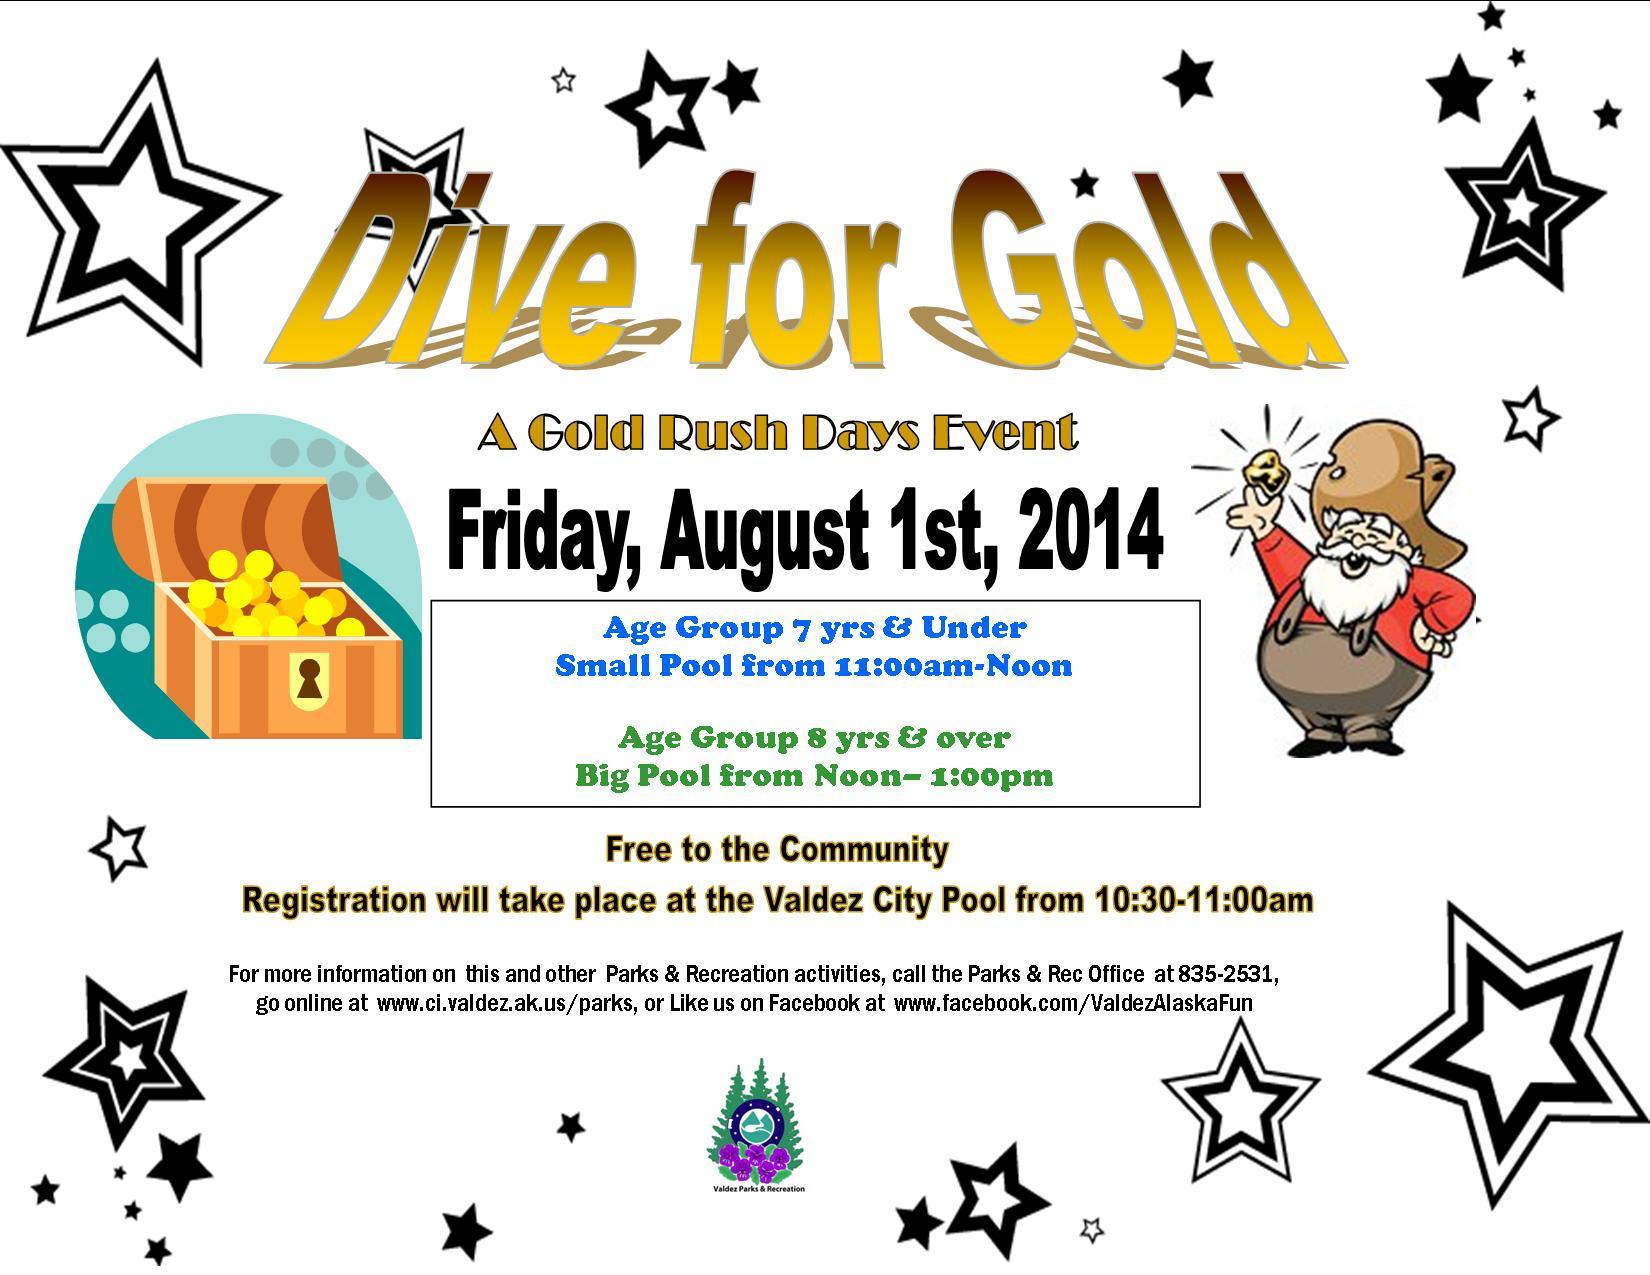 Friday August 1st Free Community >> Valdez Ak Official Website